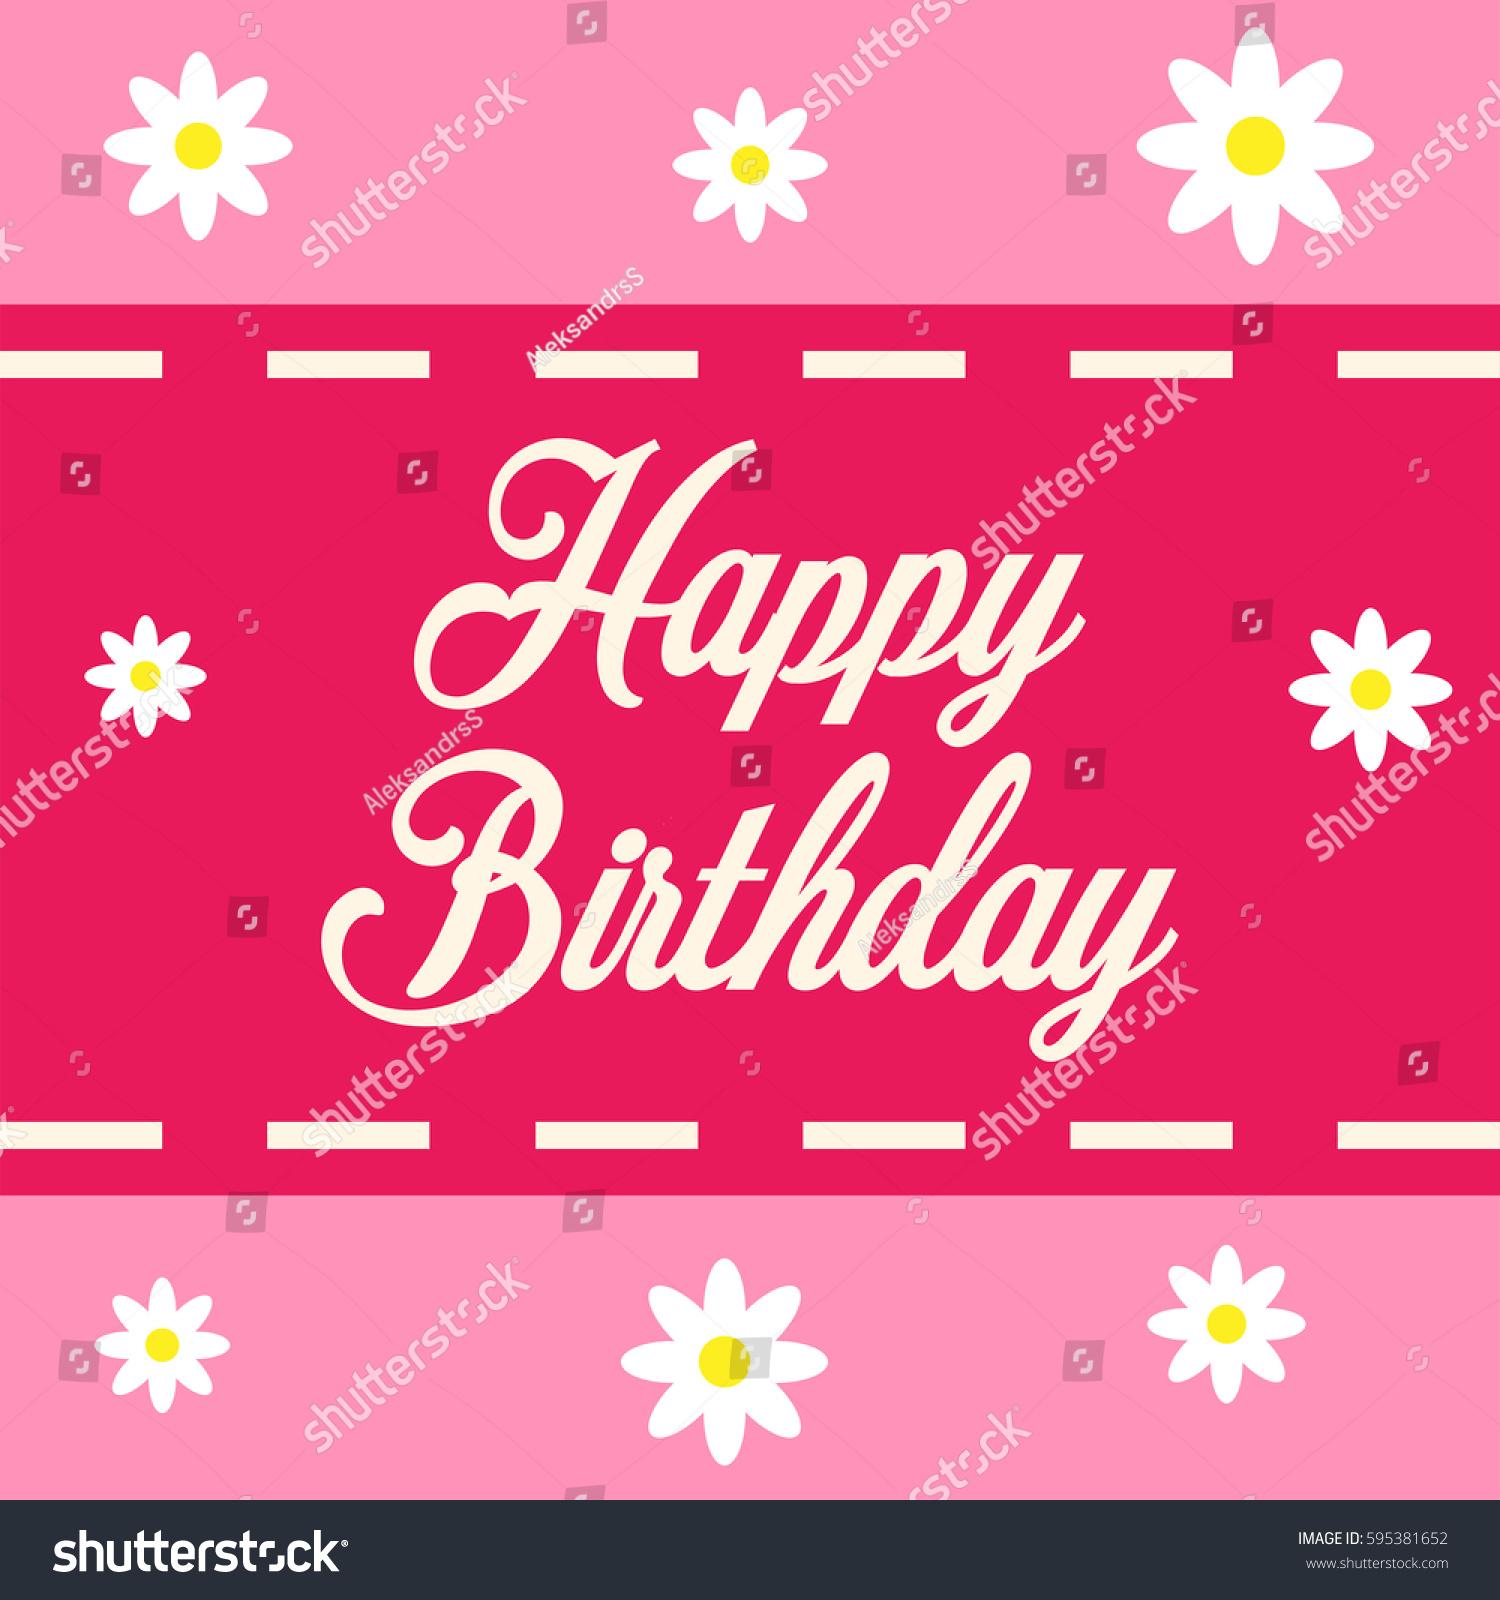 Happy birthday greeting card flowers stock vector 595381652 happy birthday greeting card with flowers kristyandbryce Gallery